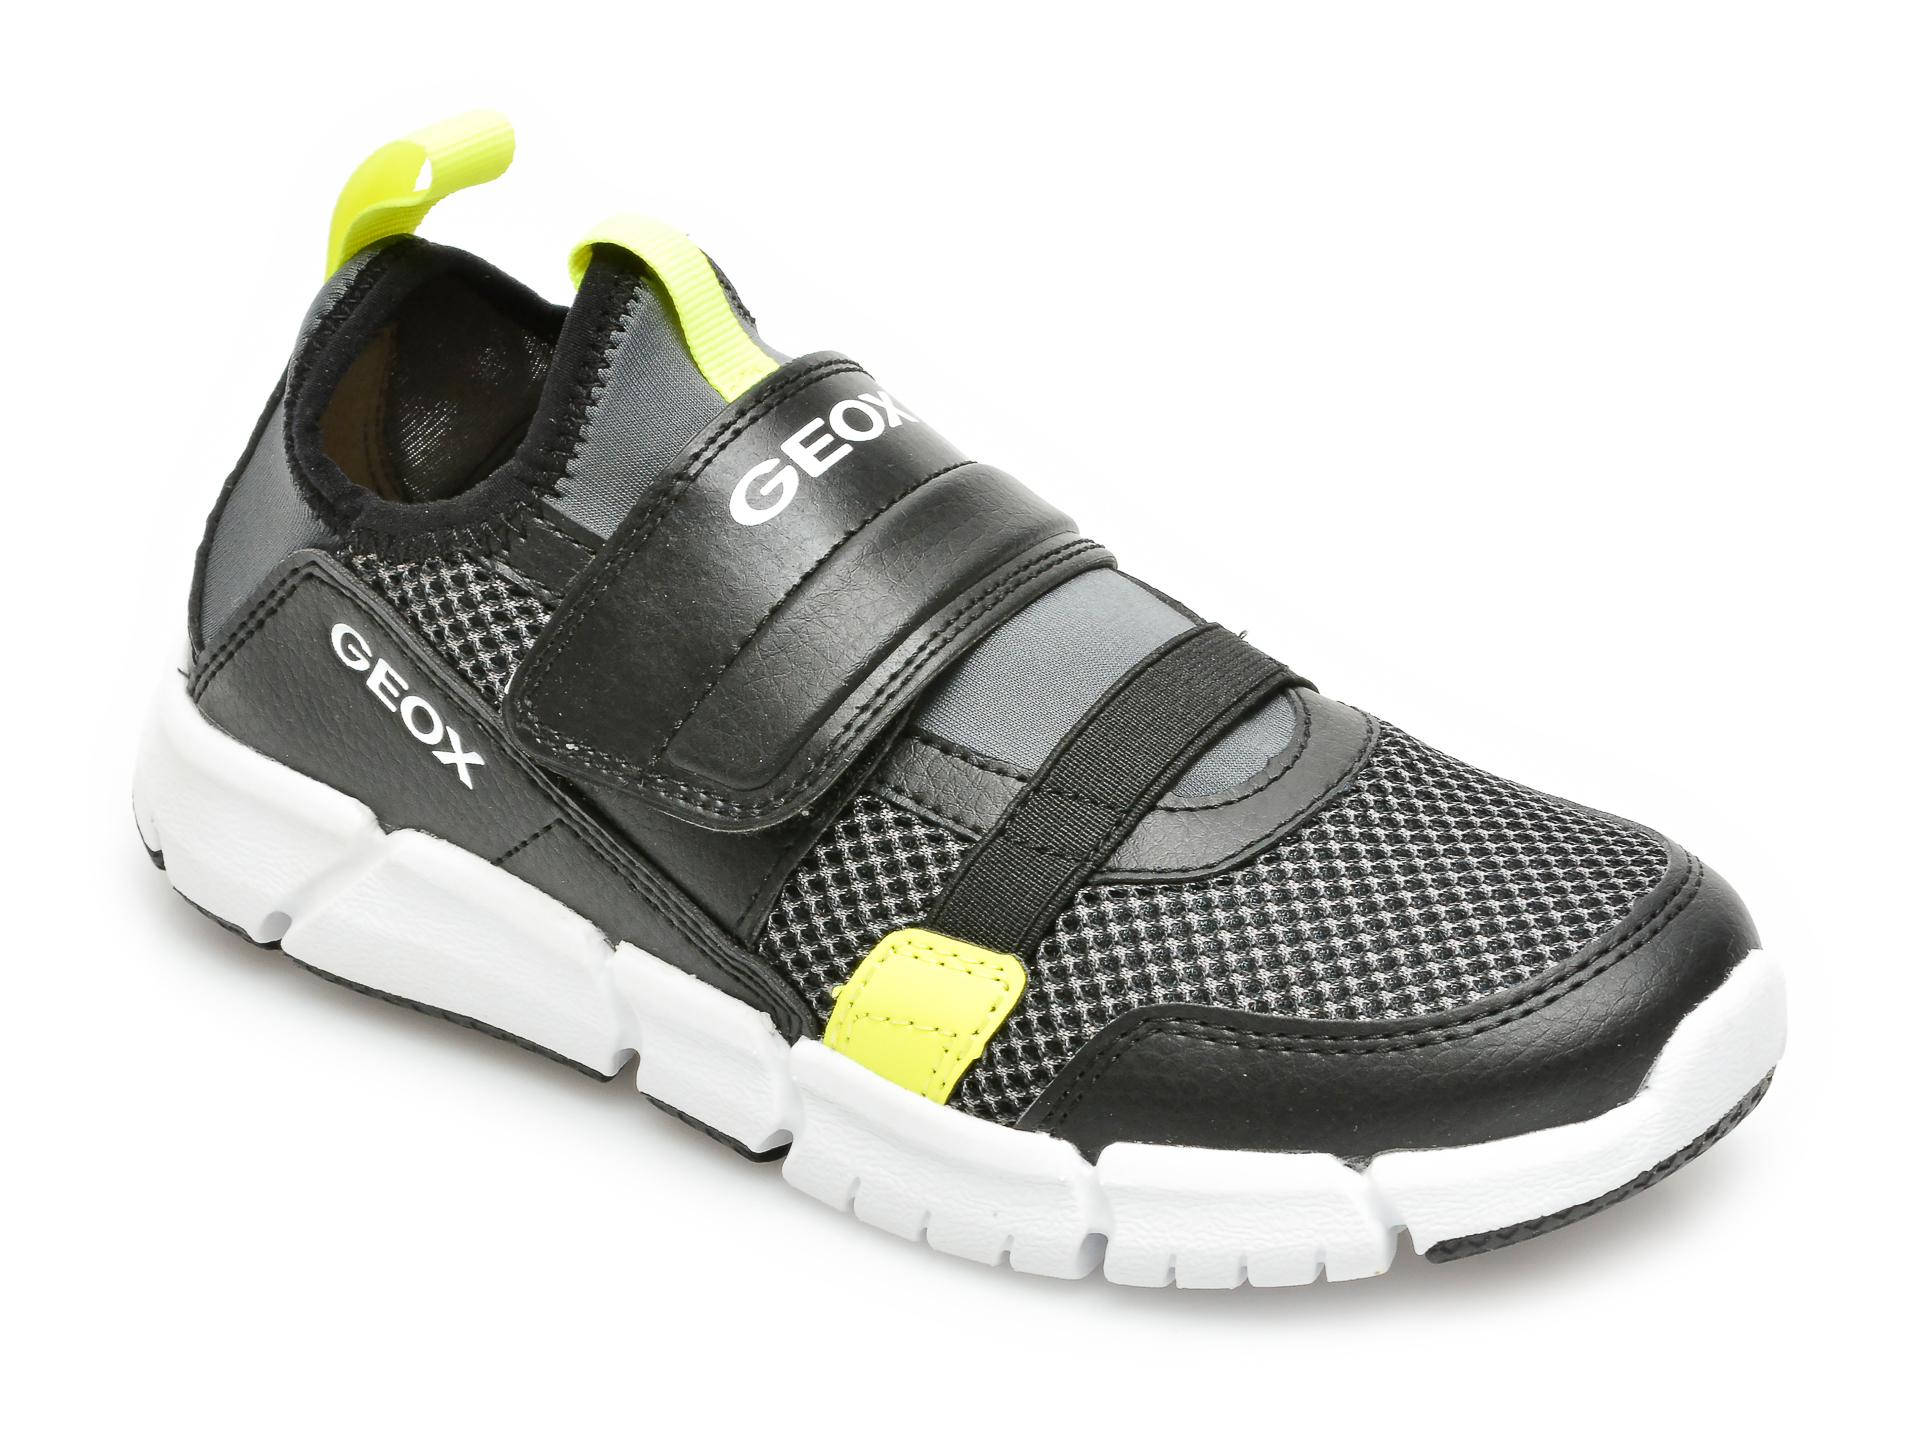 Pantofi sport GEOX negri, J159BC, din material textil si piele ecologica